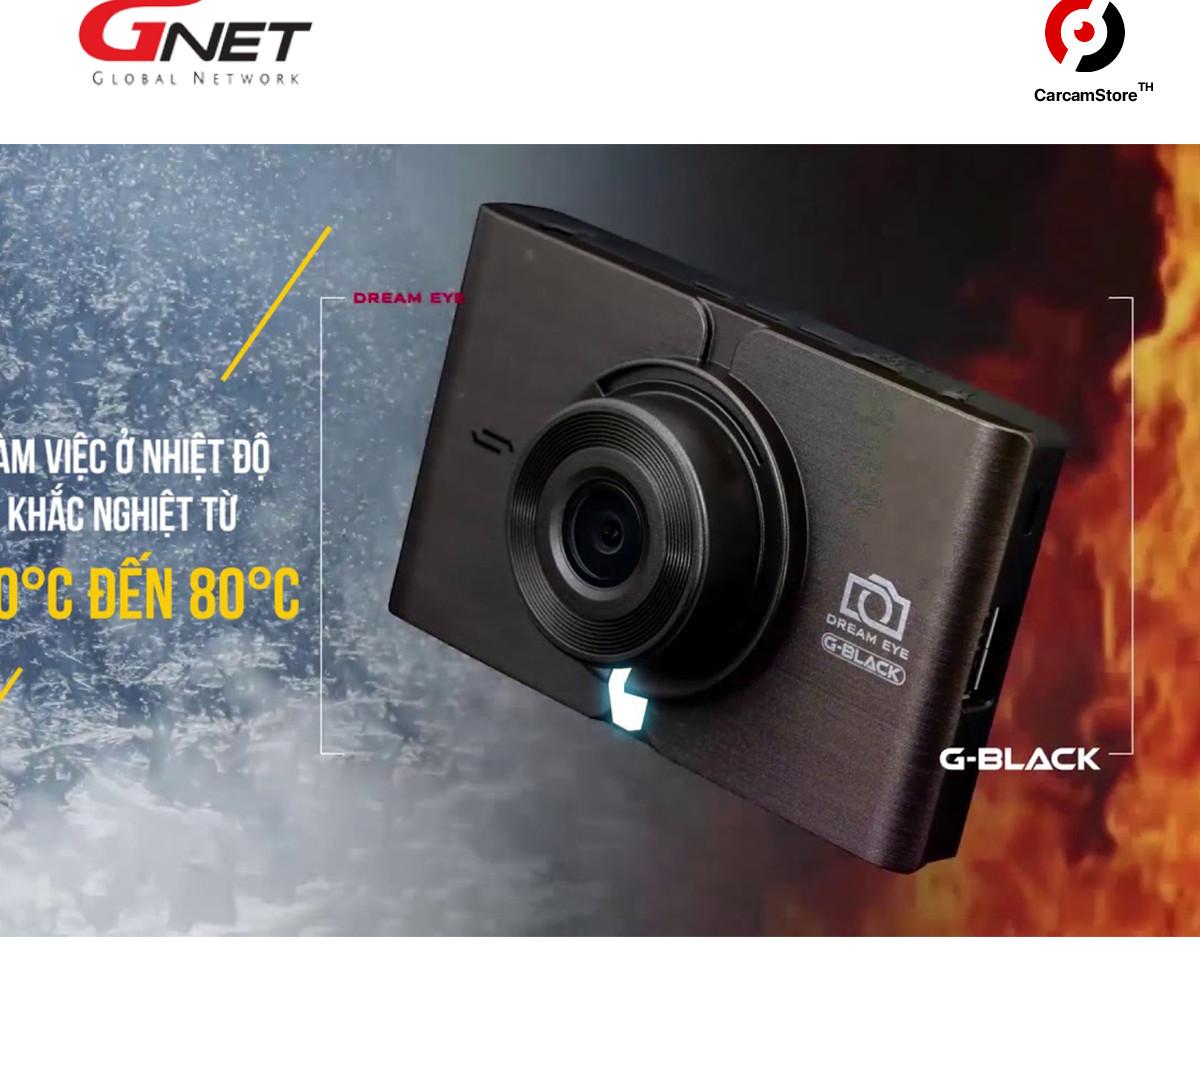 GNET G-Black